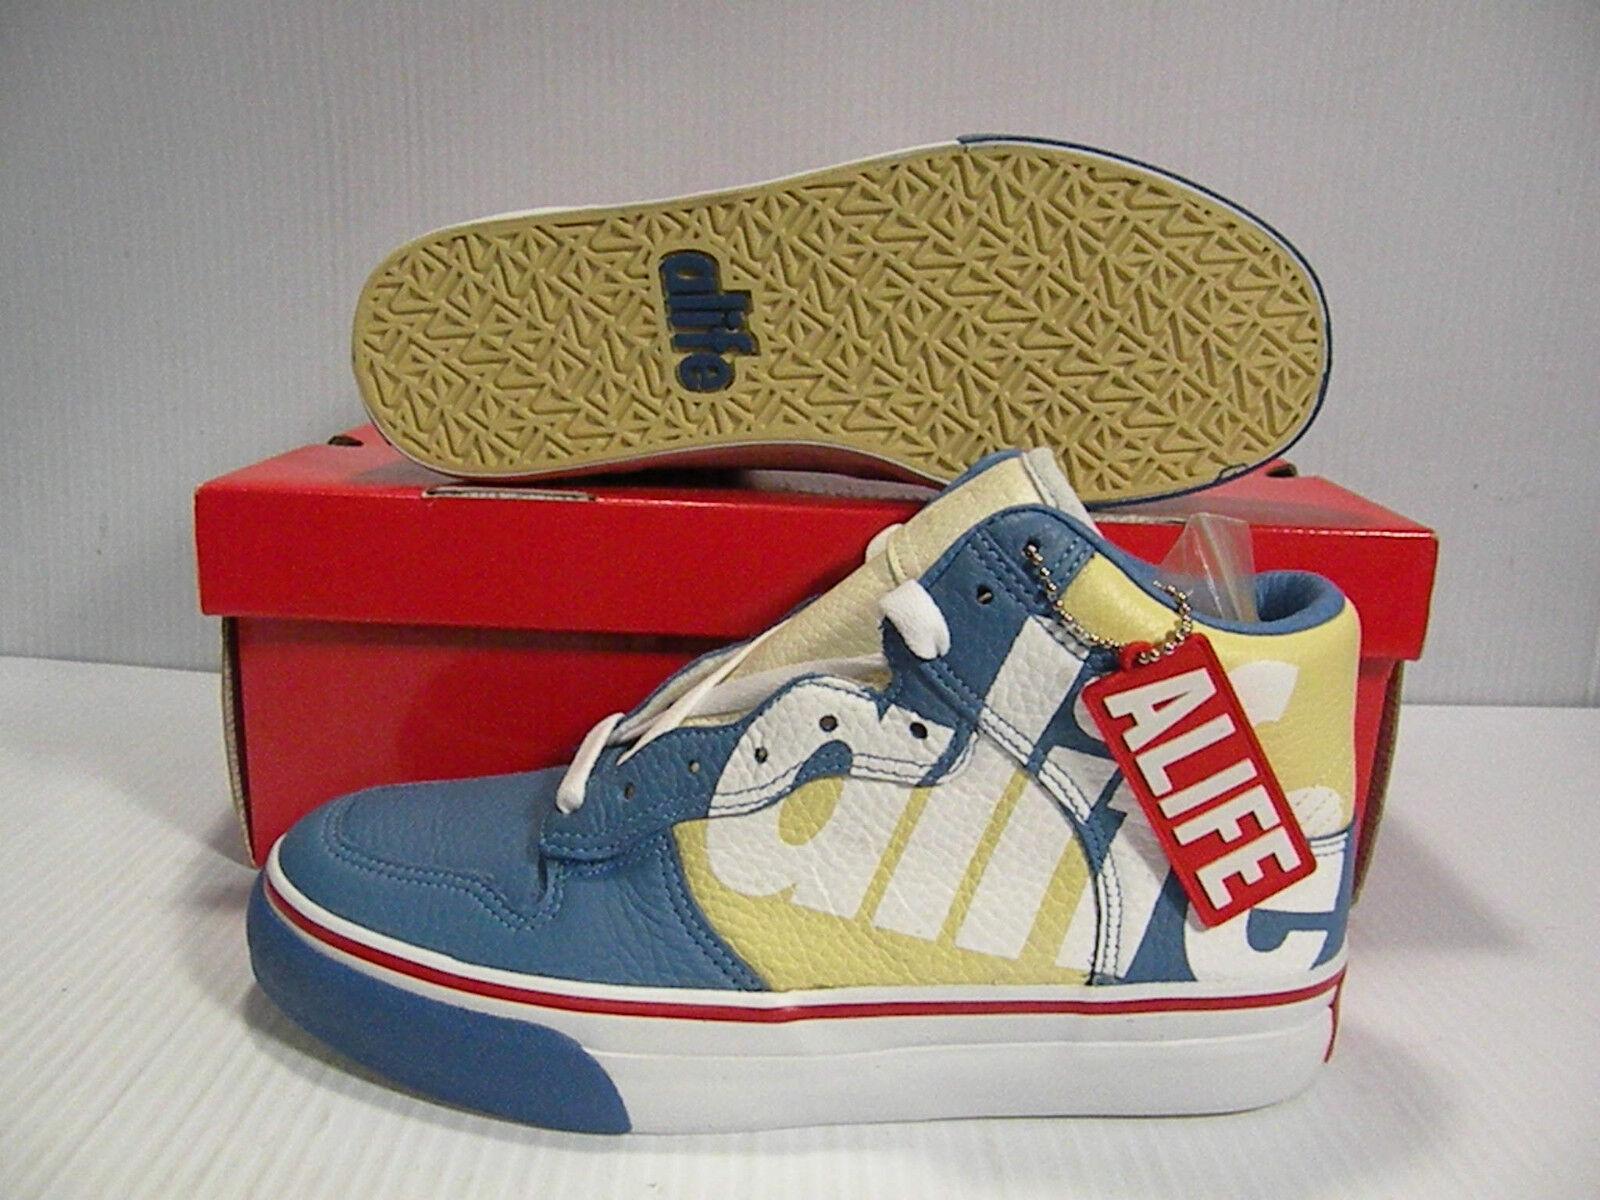 ALIFE EVERYBODY Hi CONDIMENT Hombres Zapatillas Hombres CONDIMENT Zapatos MAYONNAISE ehimyt-SPO82 Nuevo bd1a1e